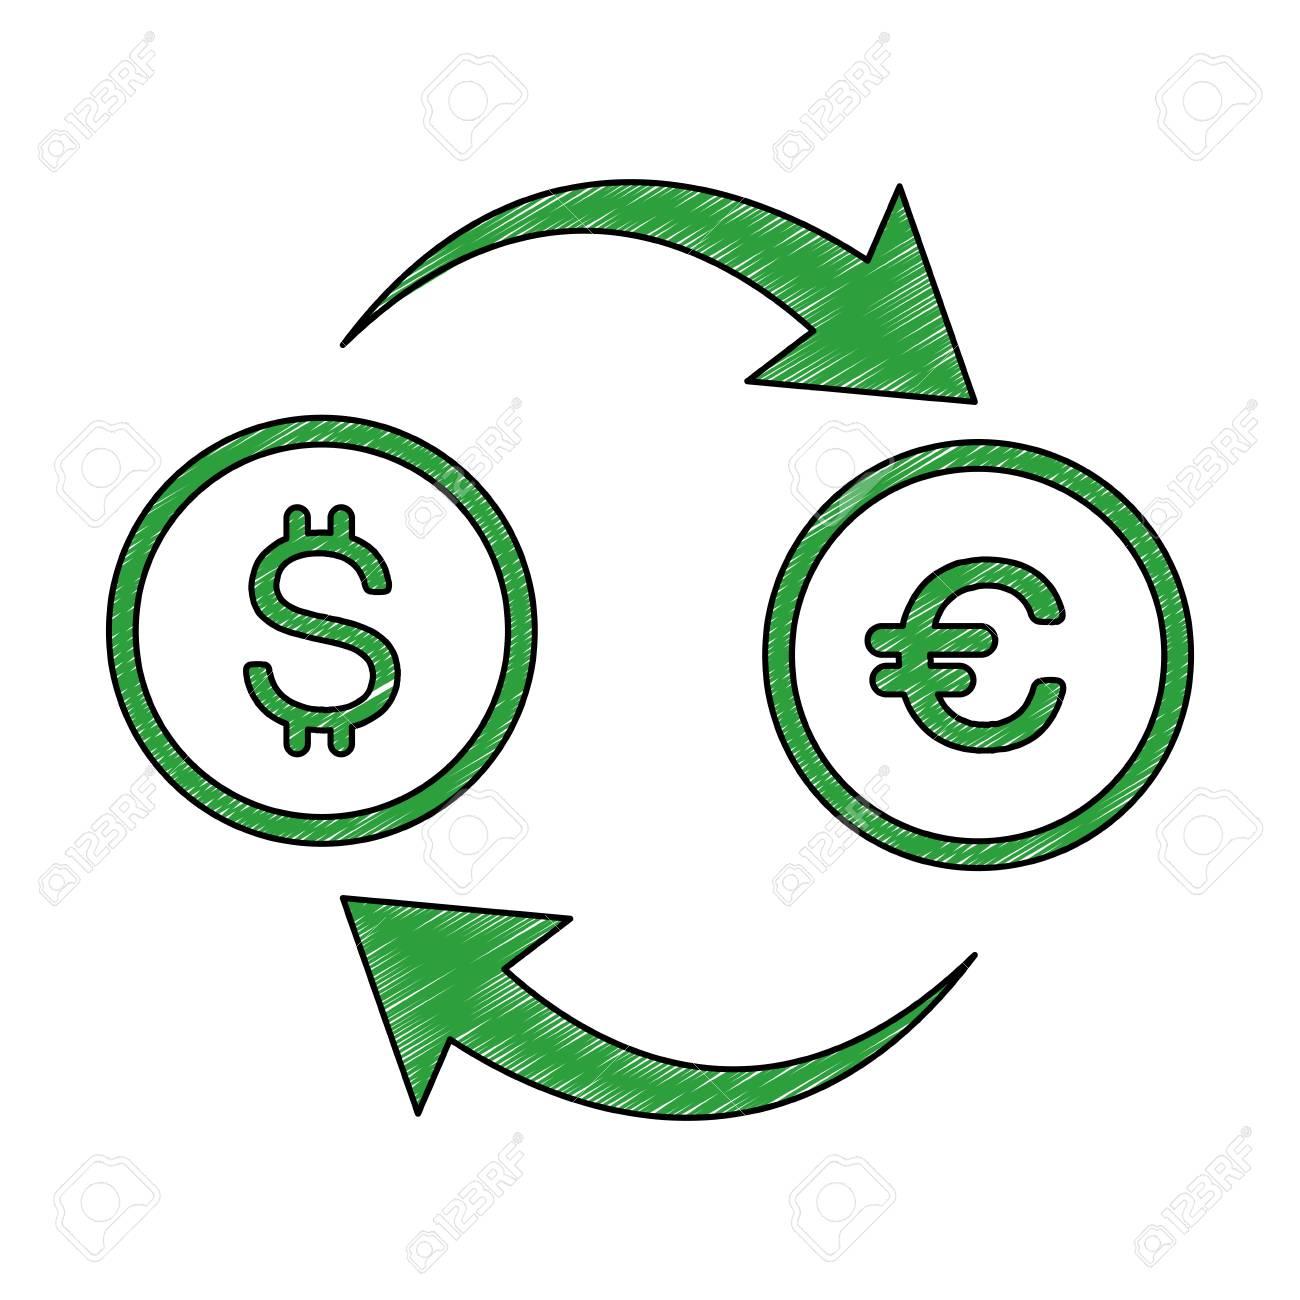 Currency Exchange Symbol Icon Vector Illustration Graphic Design